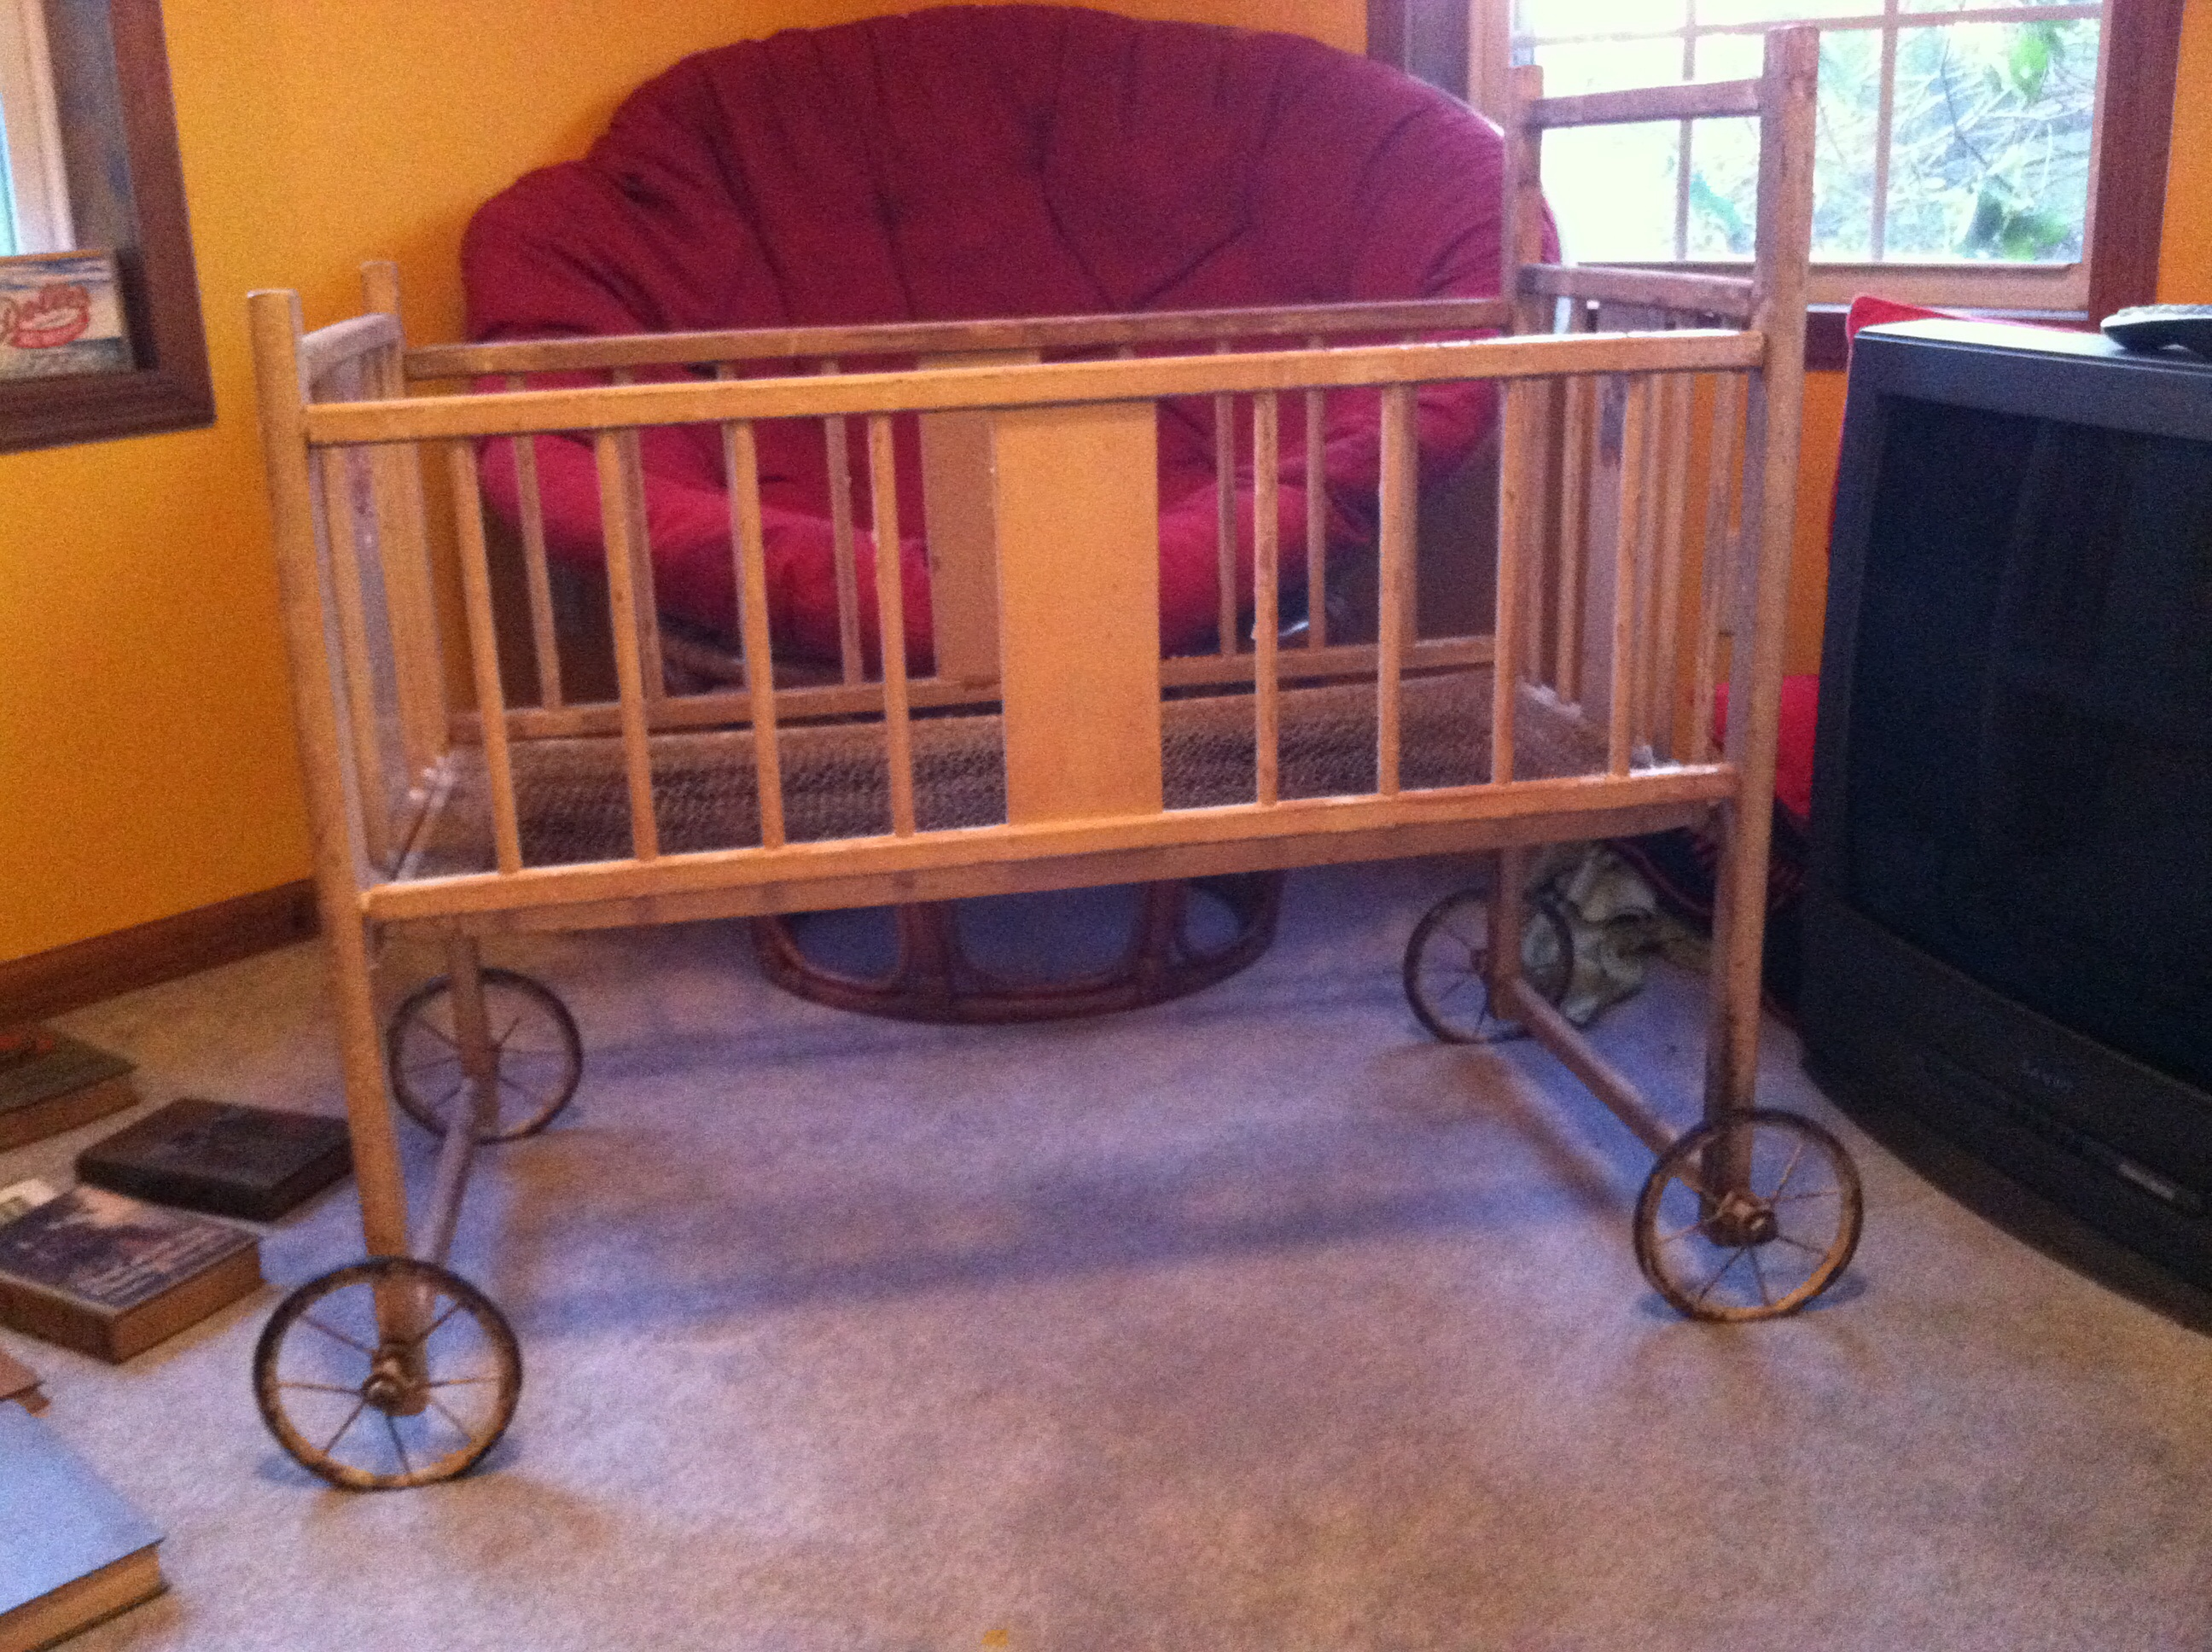 Antique Baby Doll Crib Antique Appraisal Instappraisal